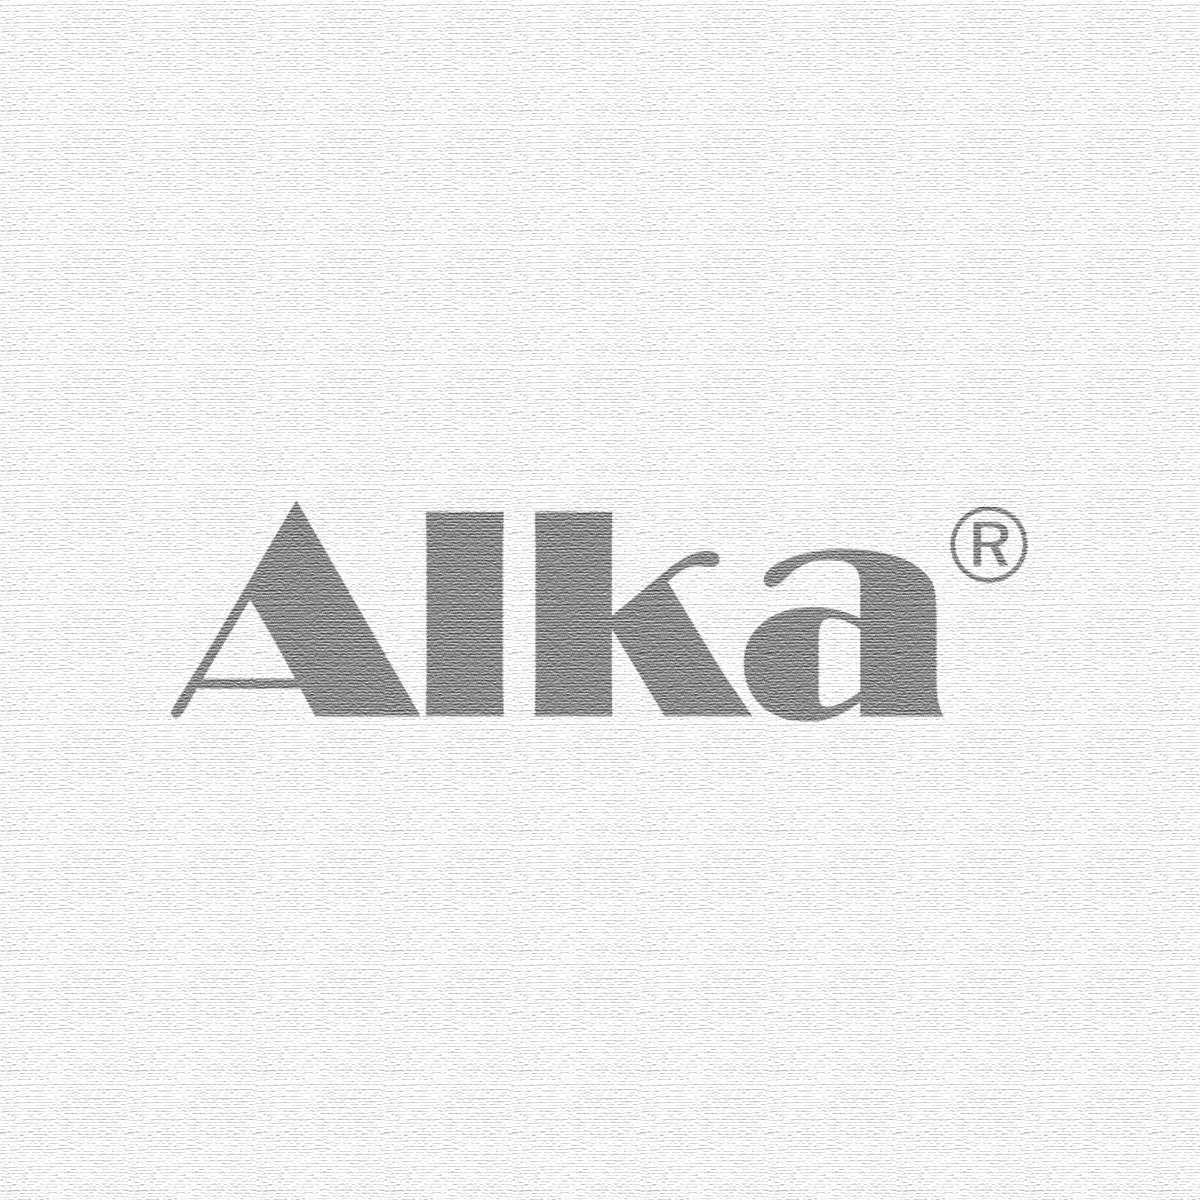 Alka® Bad - 600g - Basisch badzout - ontzurend badzout - ontzuren - natriumbicarbonaat - Alka®